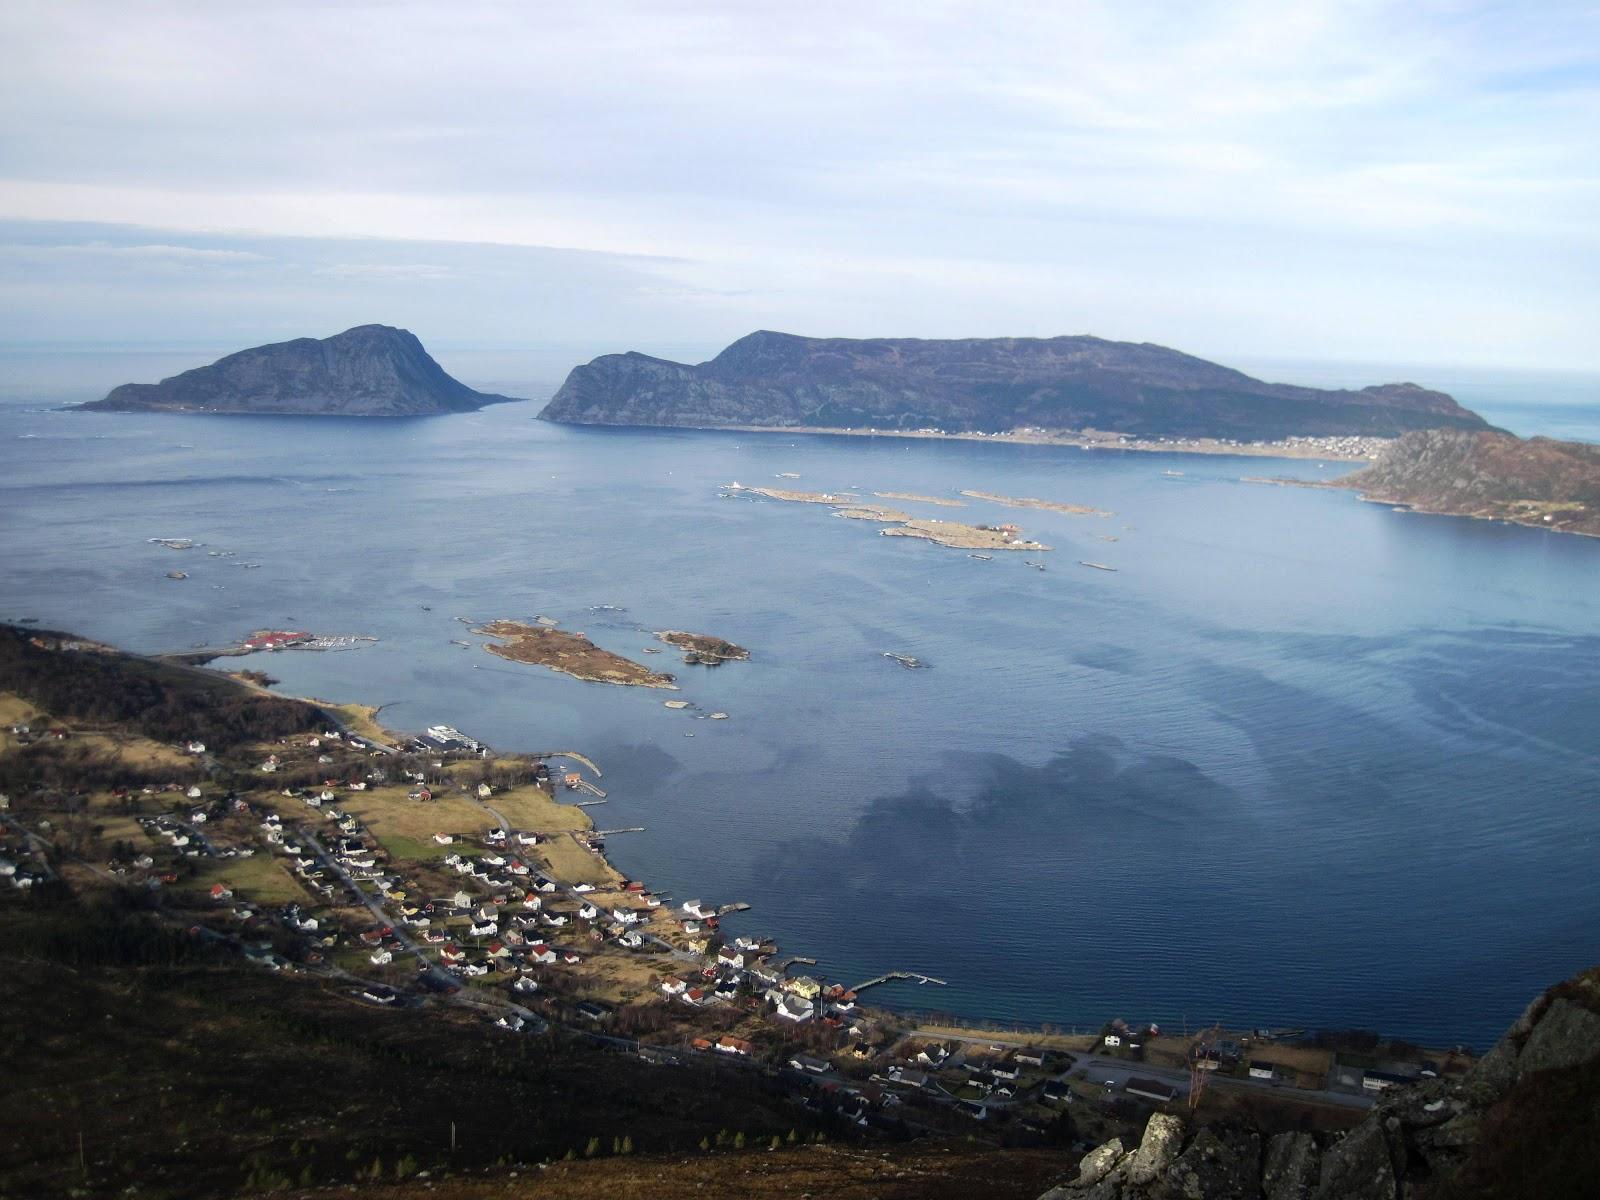 moltustranda kart Lene sin!: Gøy i Gursken (7 fjellstur) moltustranda kart